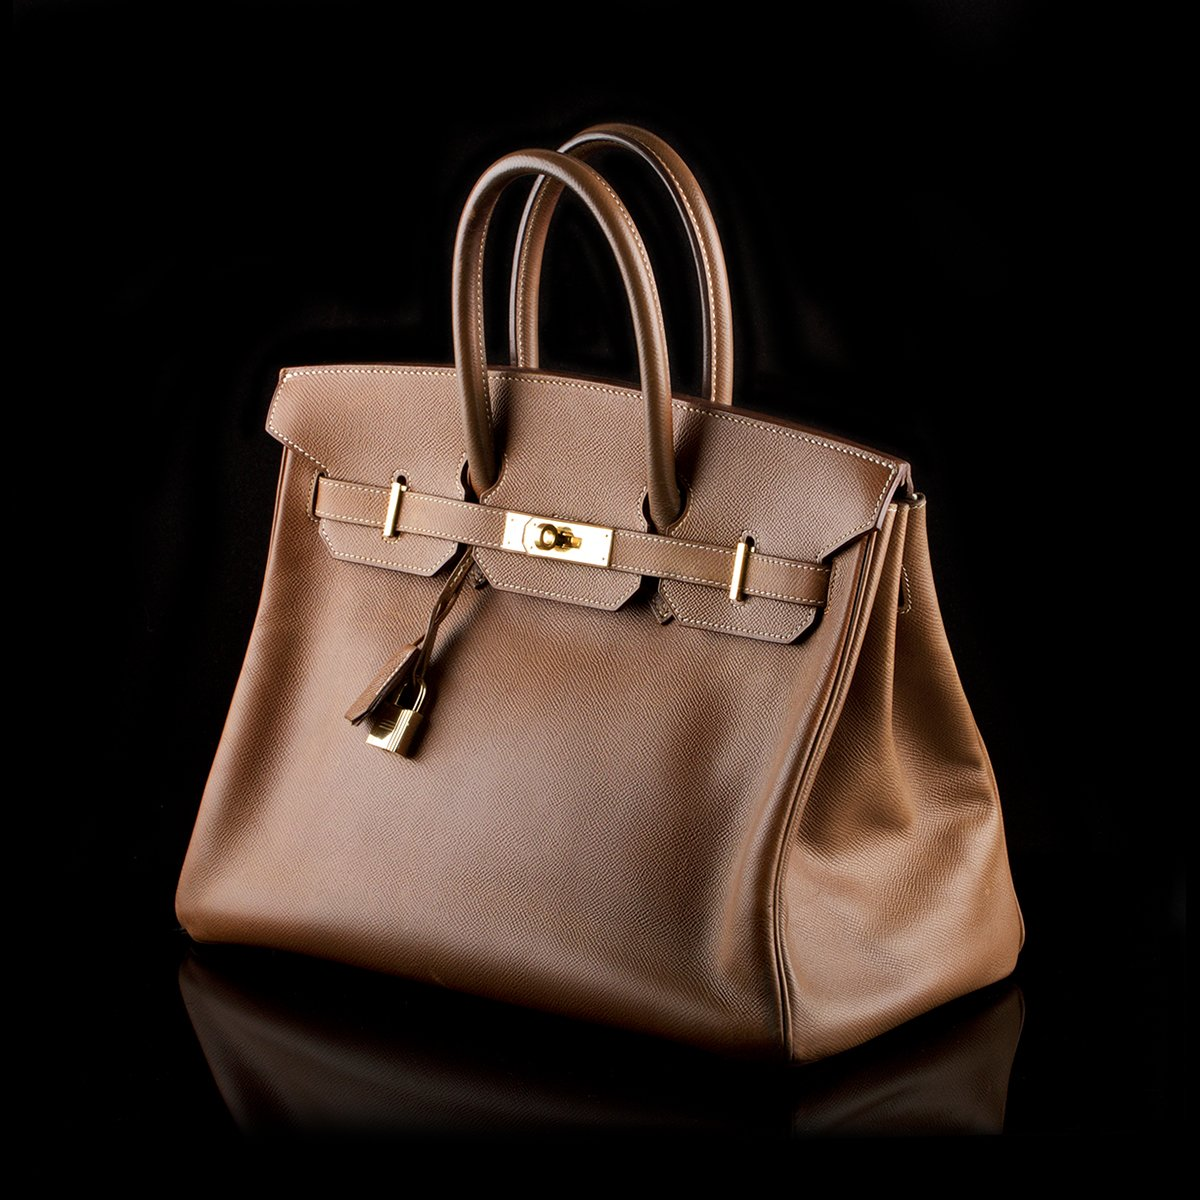 24ba1b58e871 Hermès Birkin 35 Handbag Cognac Epsom Leather - Classic390